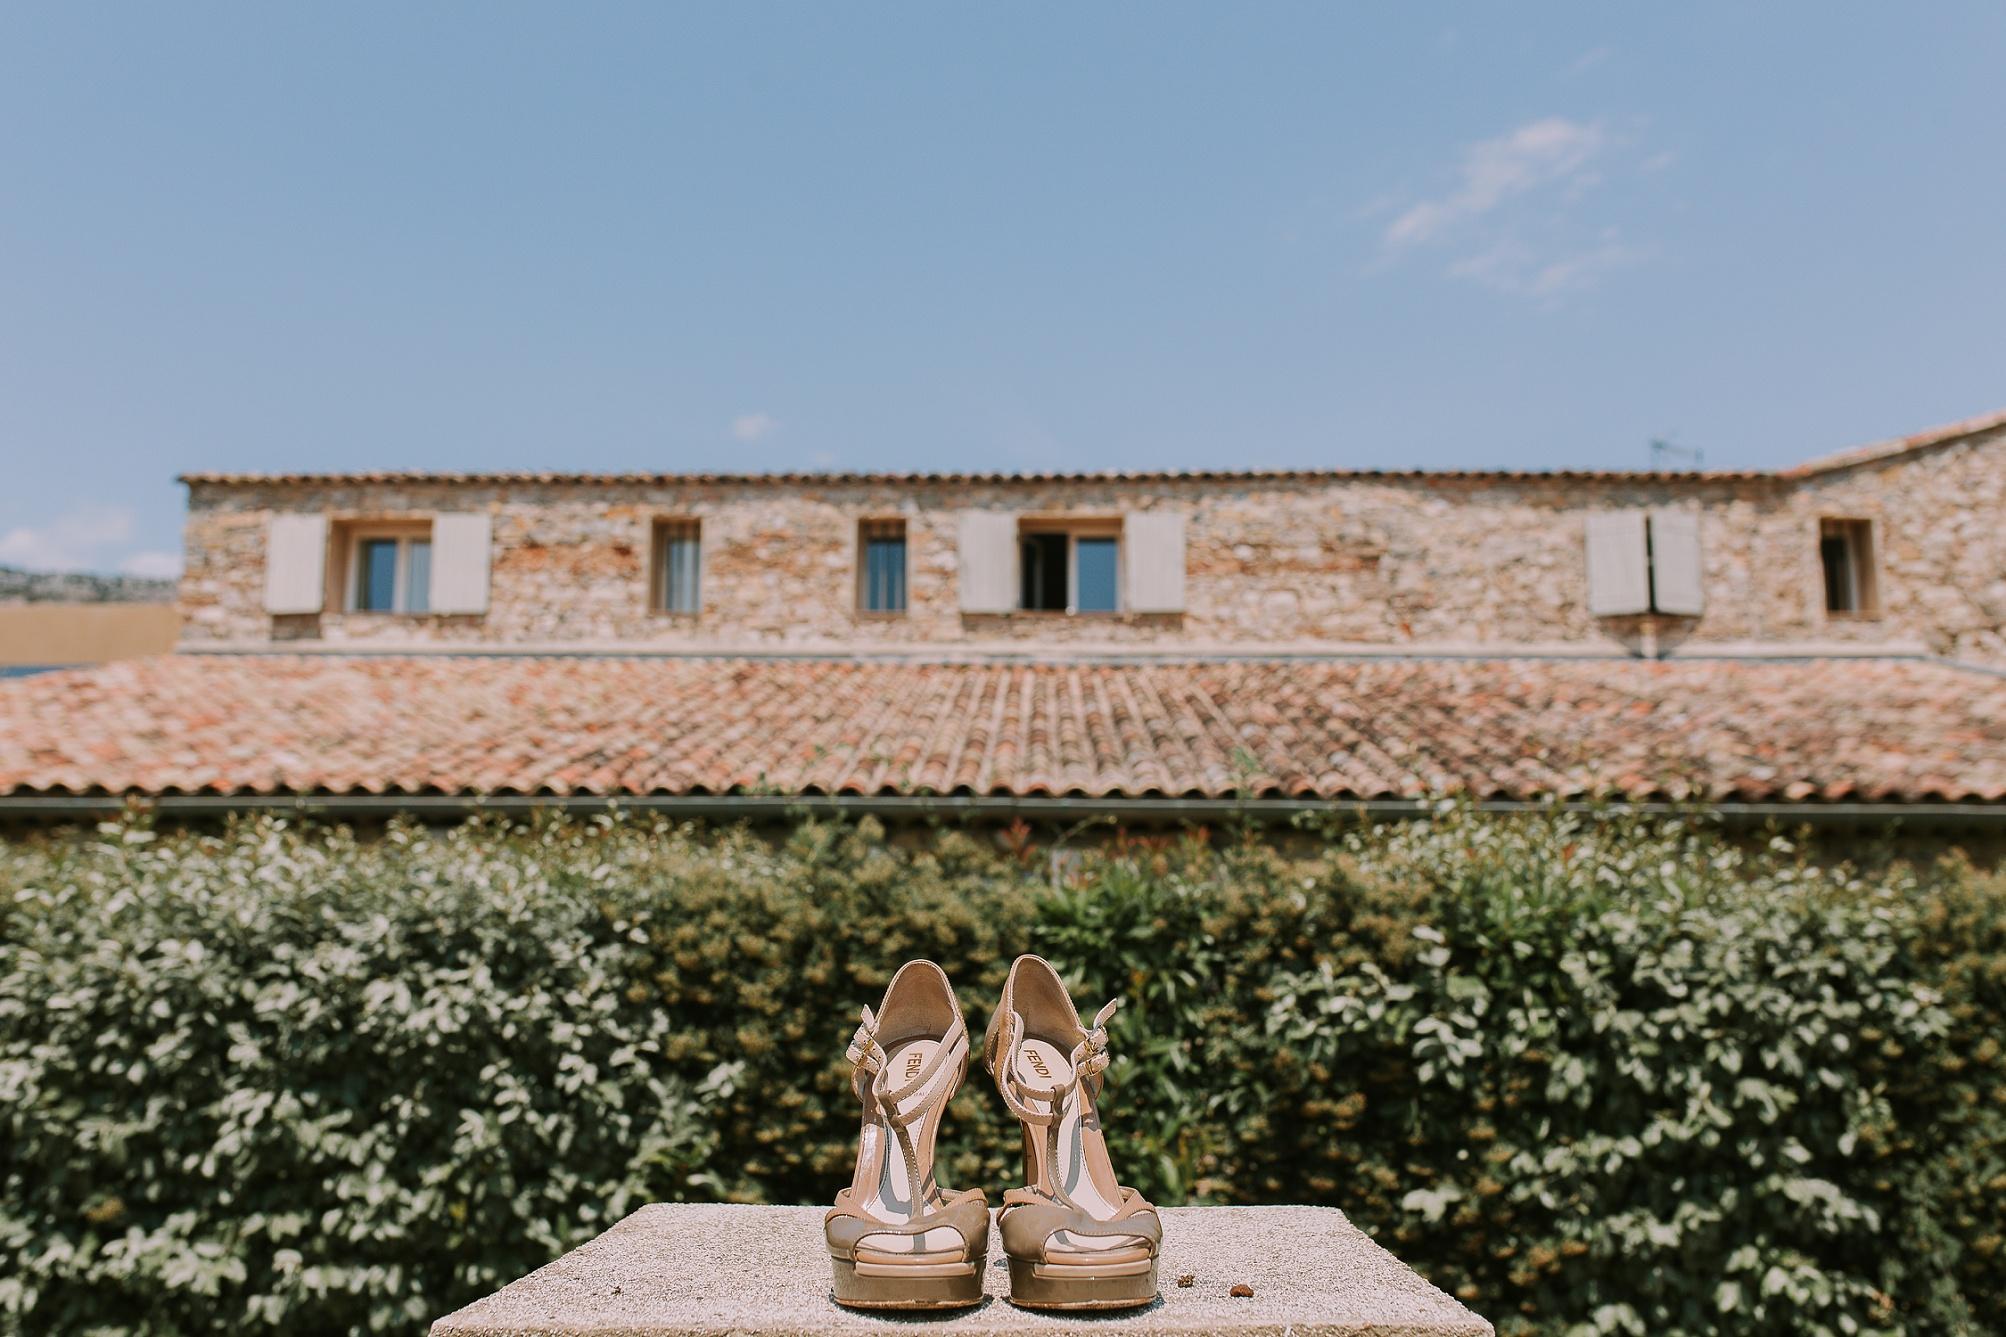 katerynaphotos-mariage-photographe-puyloubier-provence-aix-en-provence-sud-de-la-france_0329.jpg